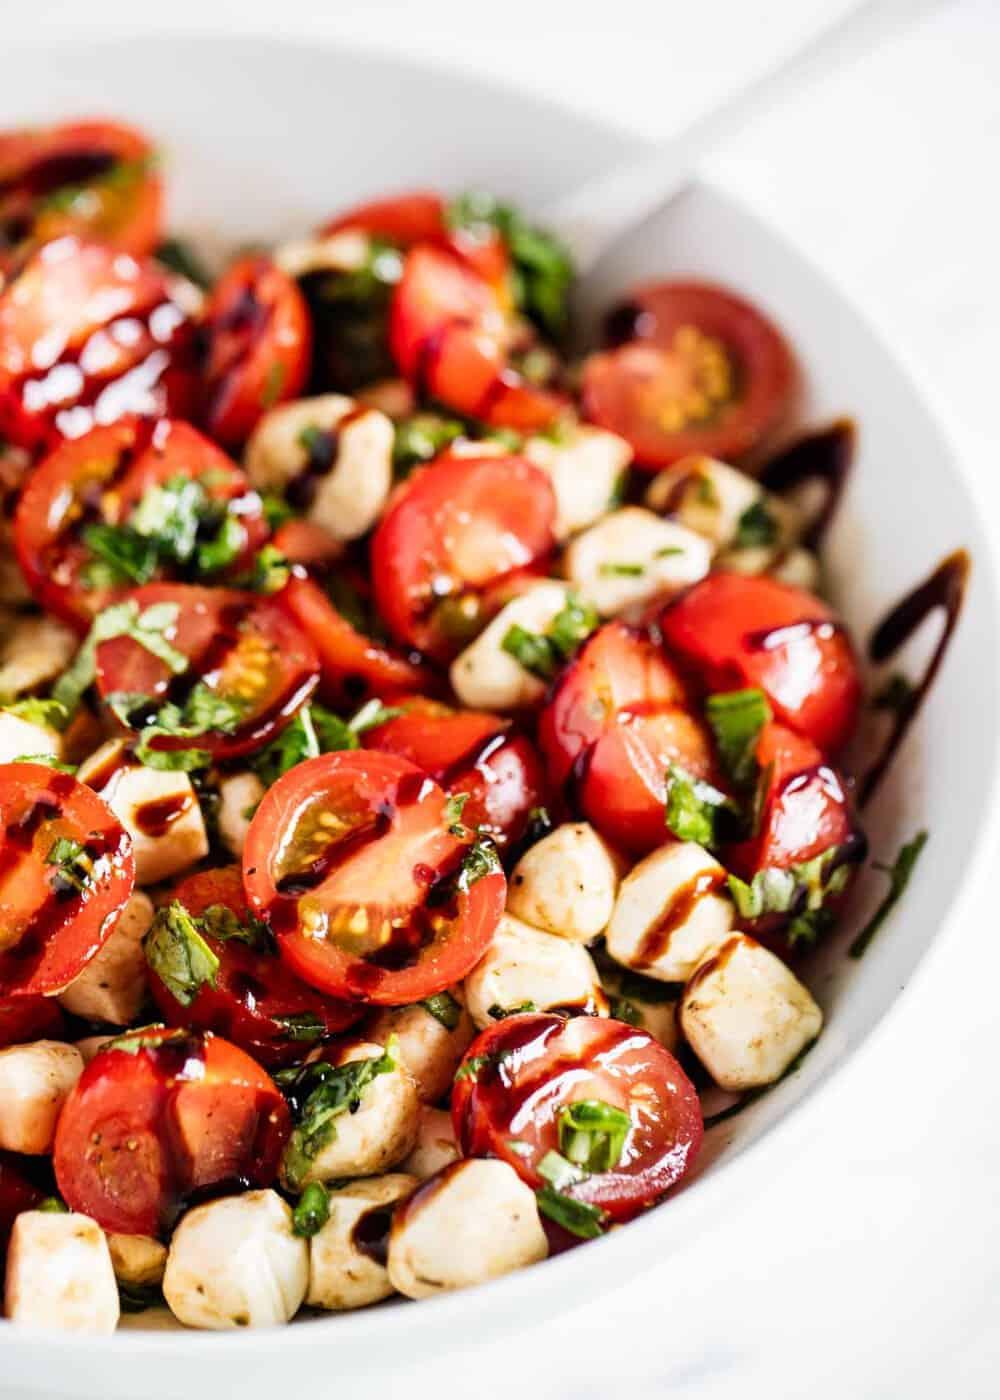 Easy Caprese Salad 10 Minutes Prep I Heart Naptime